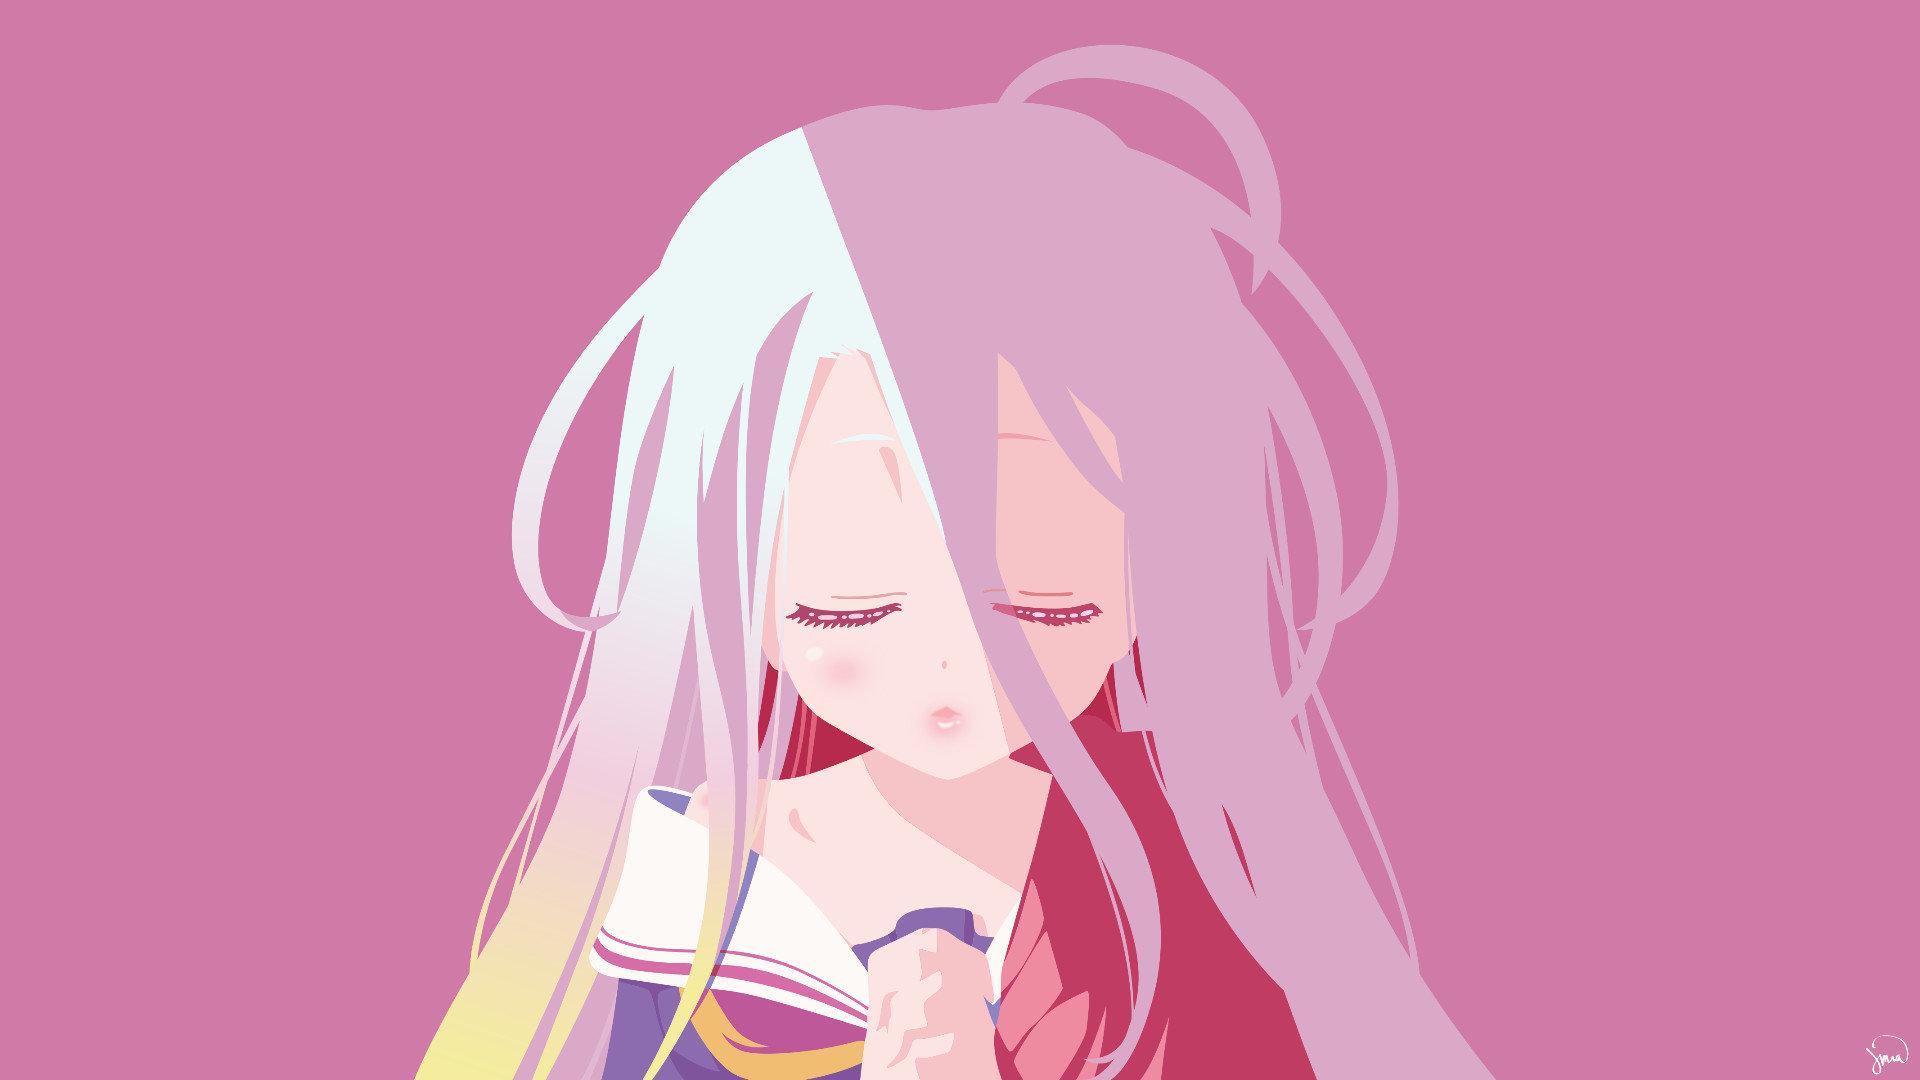 The Pet Girl Of Sakurasou Wallpaper No Game No Life Wallpapers 1920x1080 Full Hd 1080p